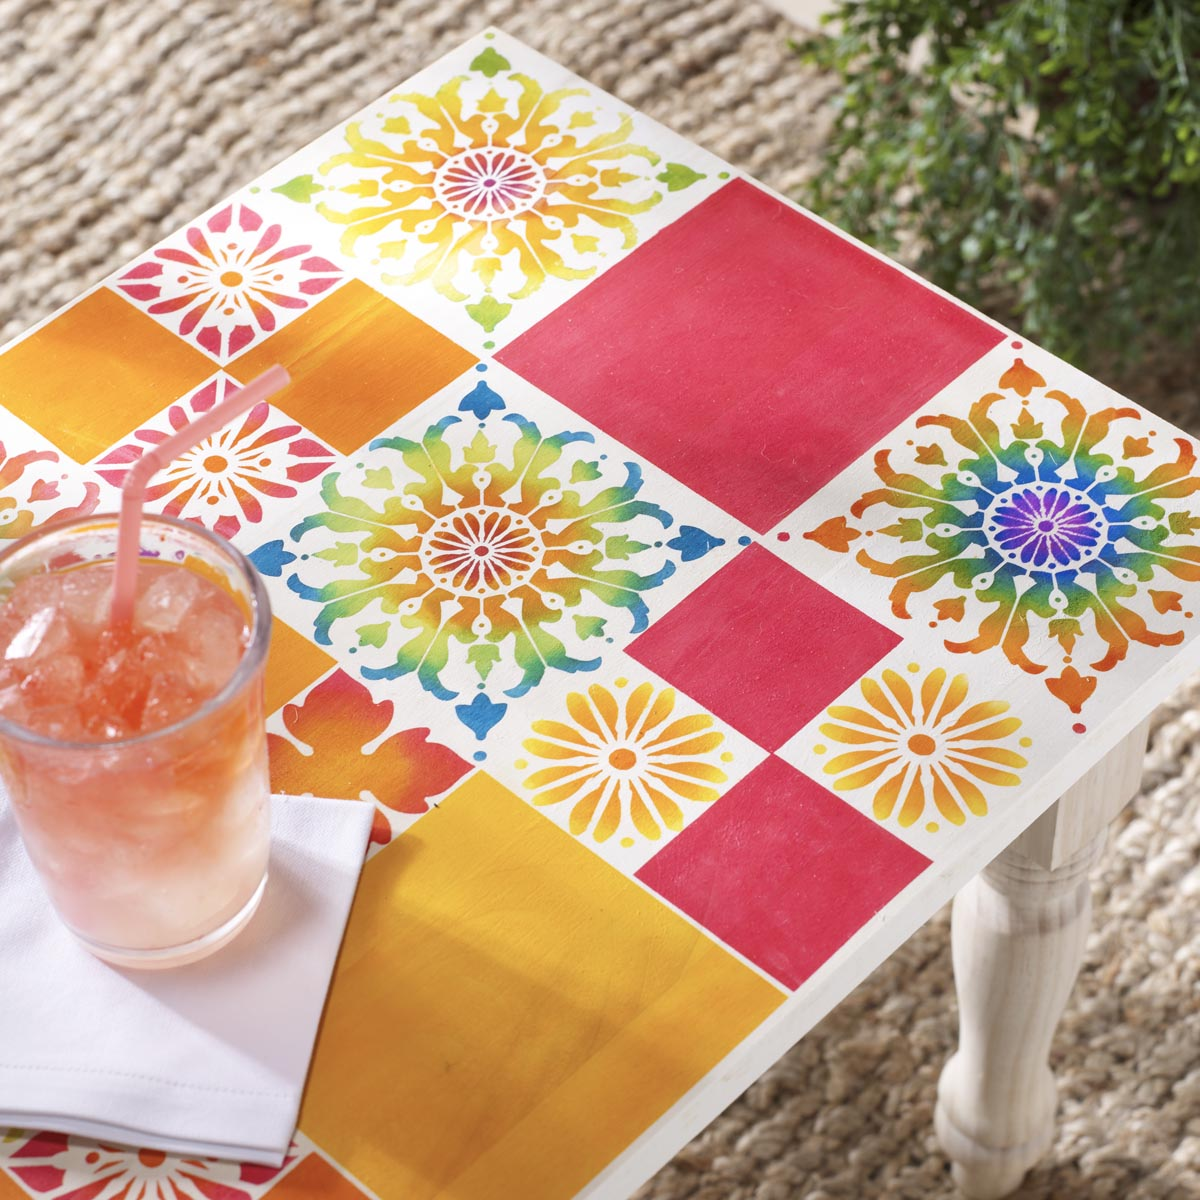 FolkArt ® Painting Stencils - Mod Flower Tile